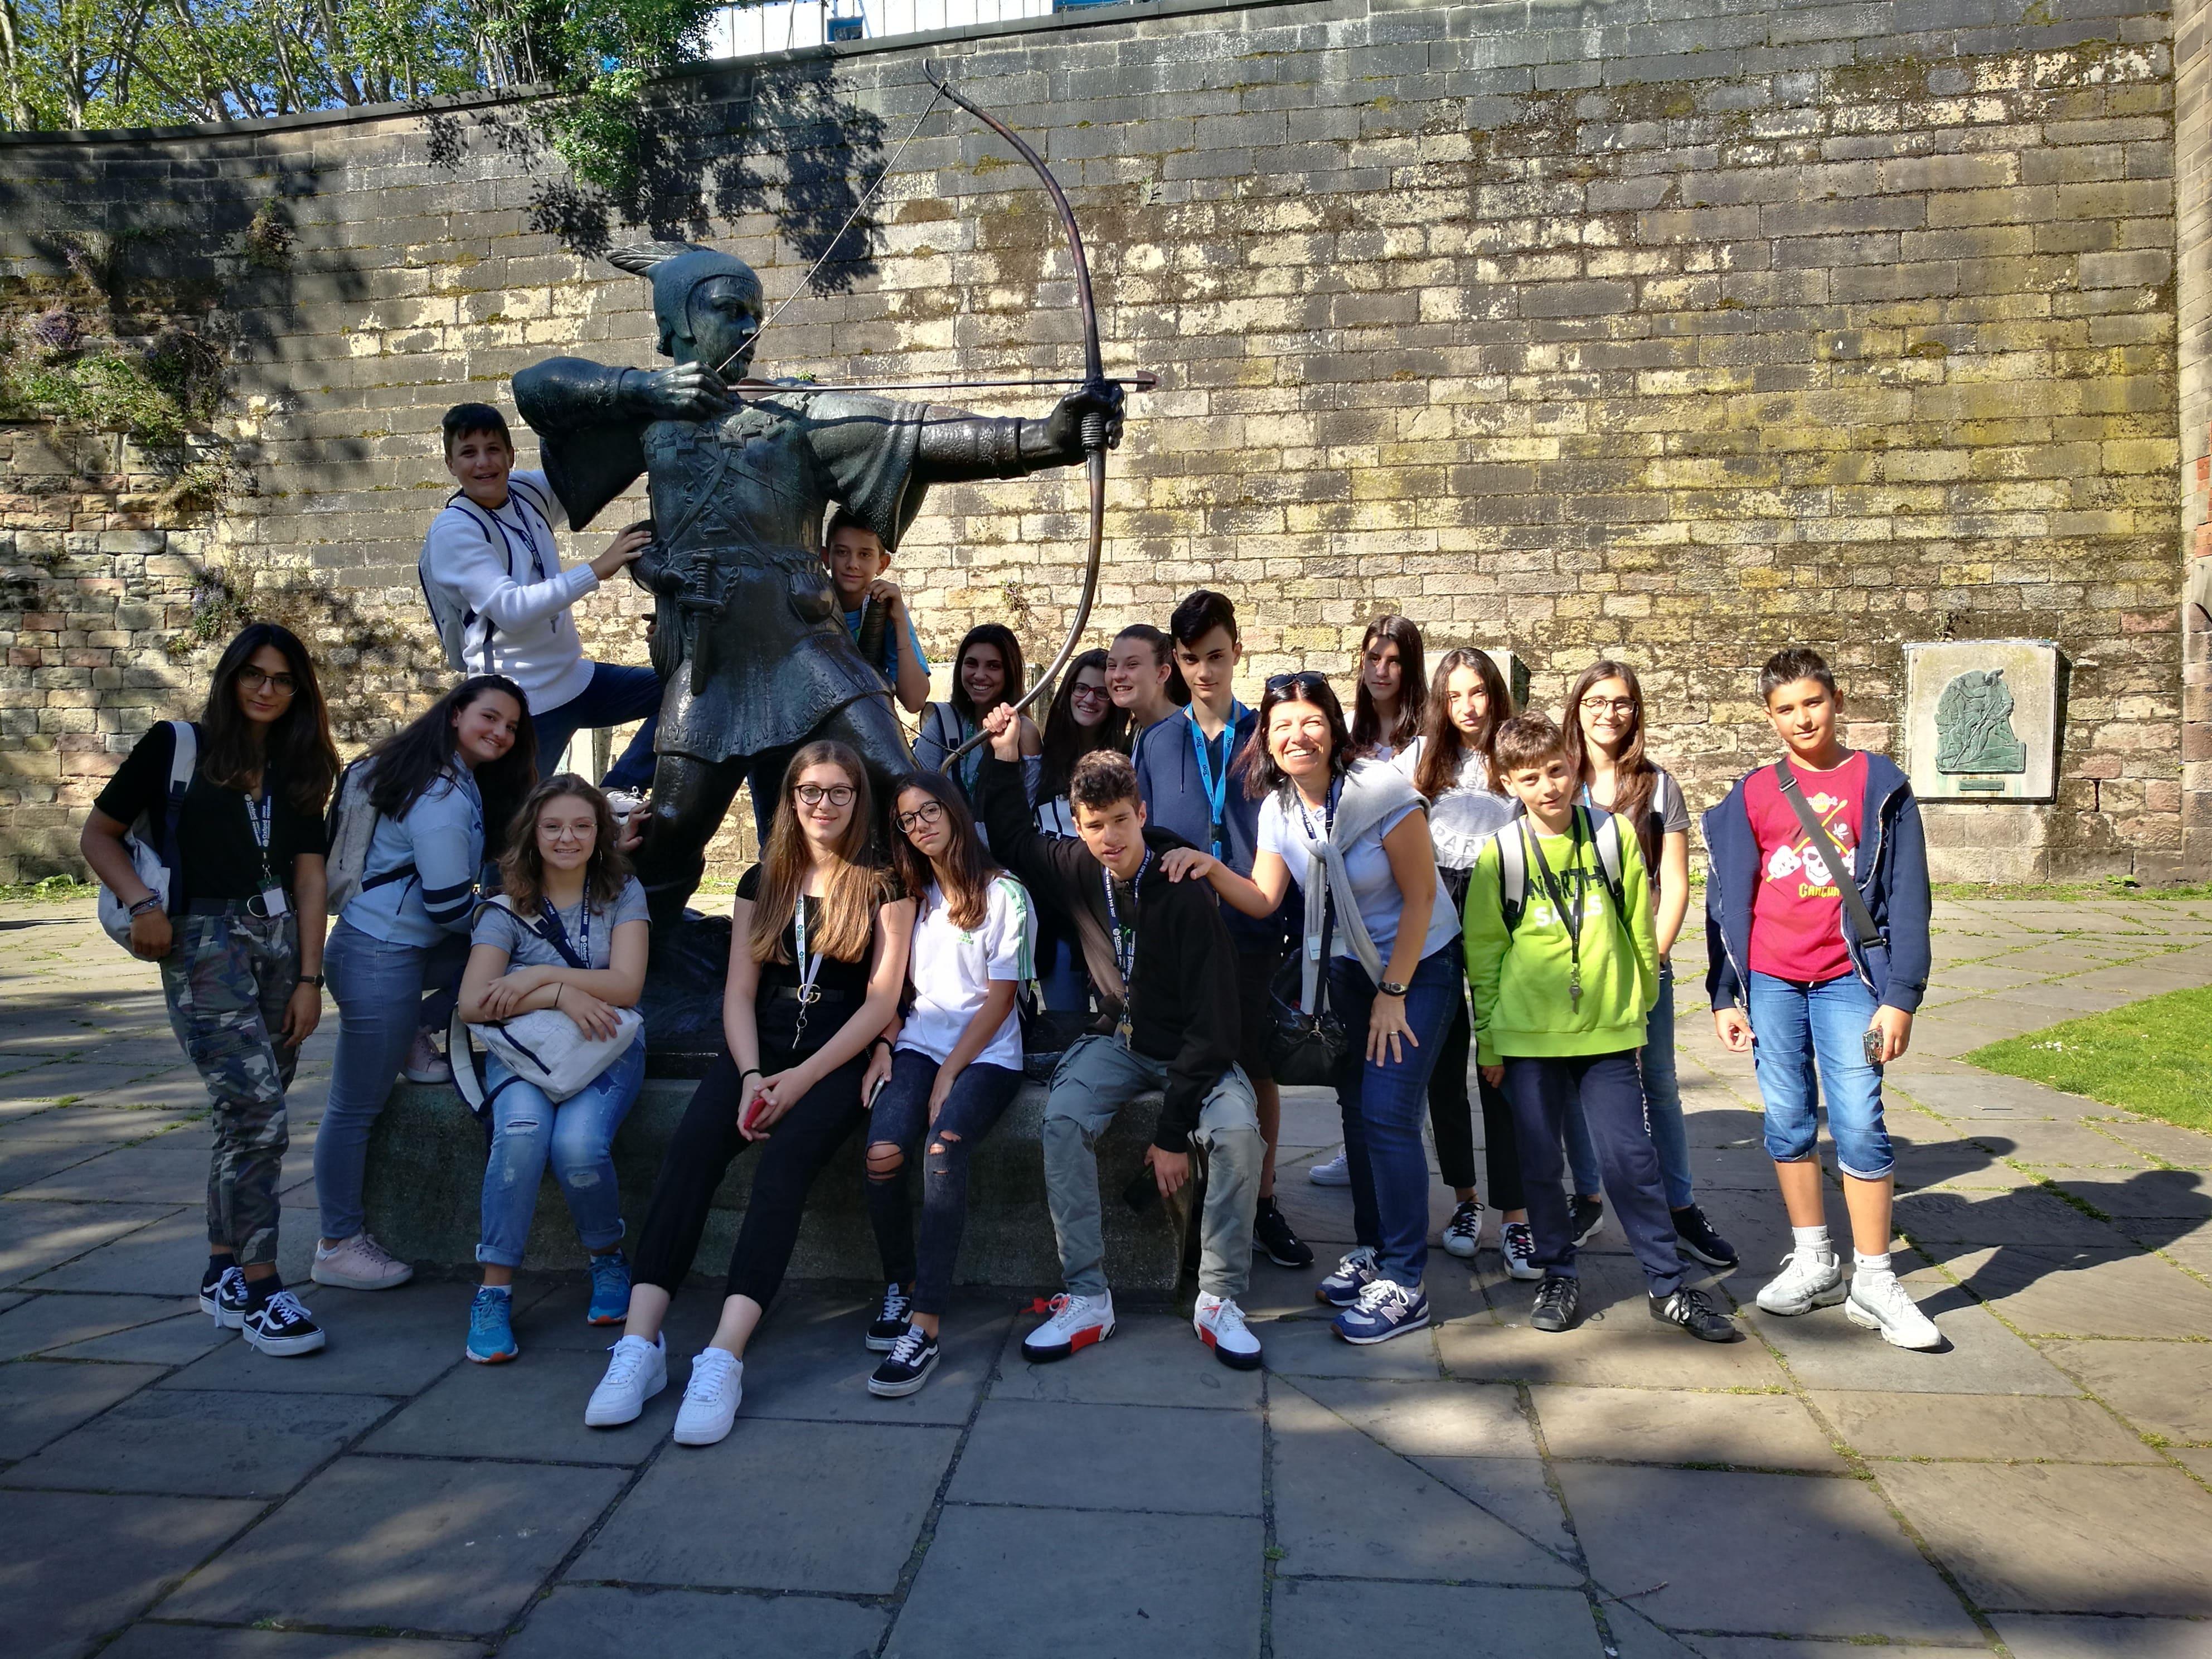 Vacanze Studio Inghilterra corsi linguistici